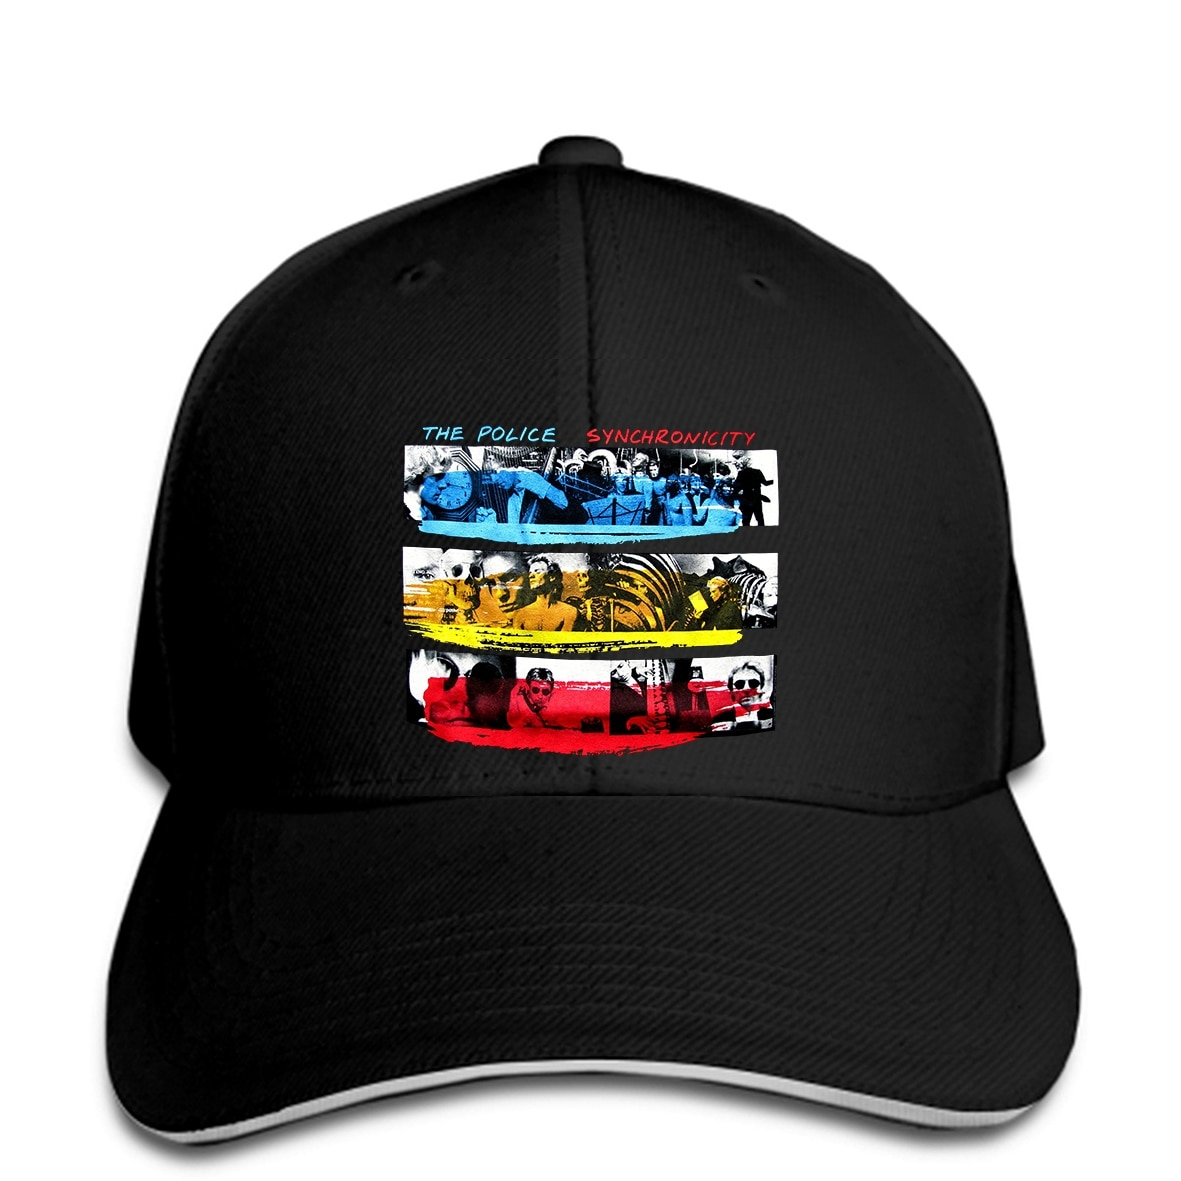 Baseball Cap New The Police Synchronicity Rock Band Sting Men Black Unisex Top Snapback hat peaked